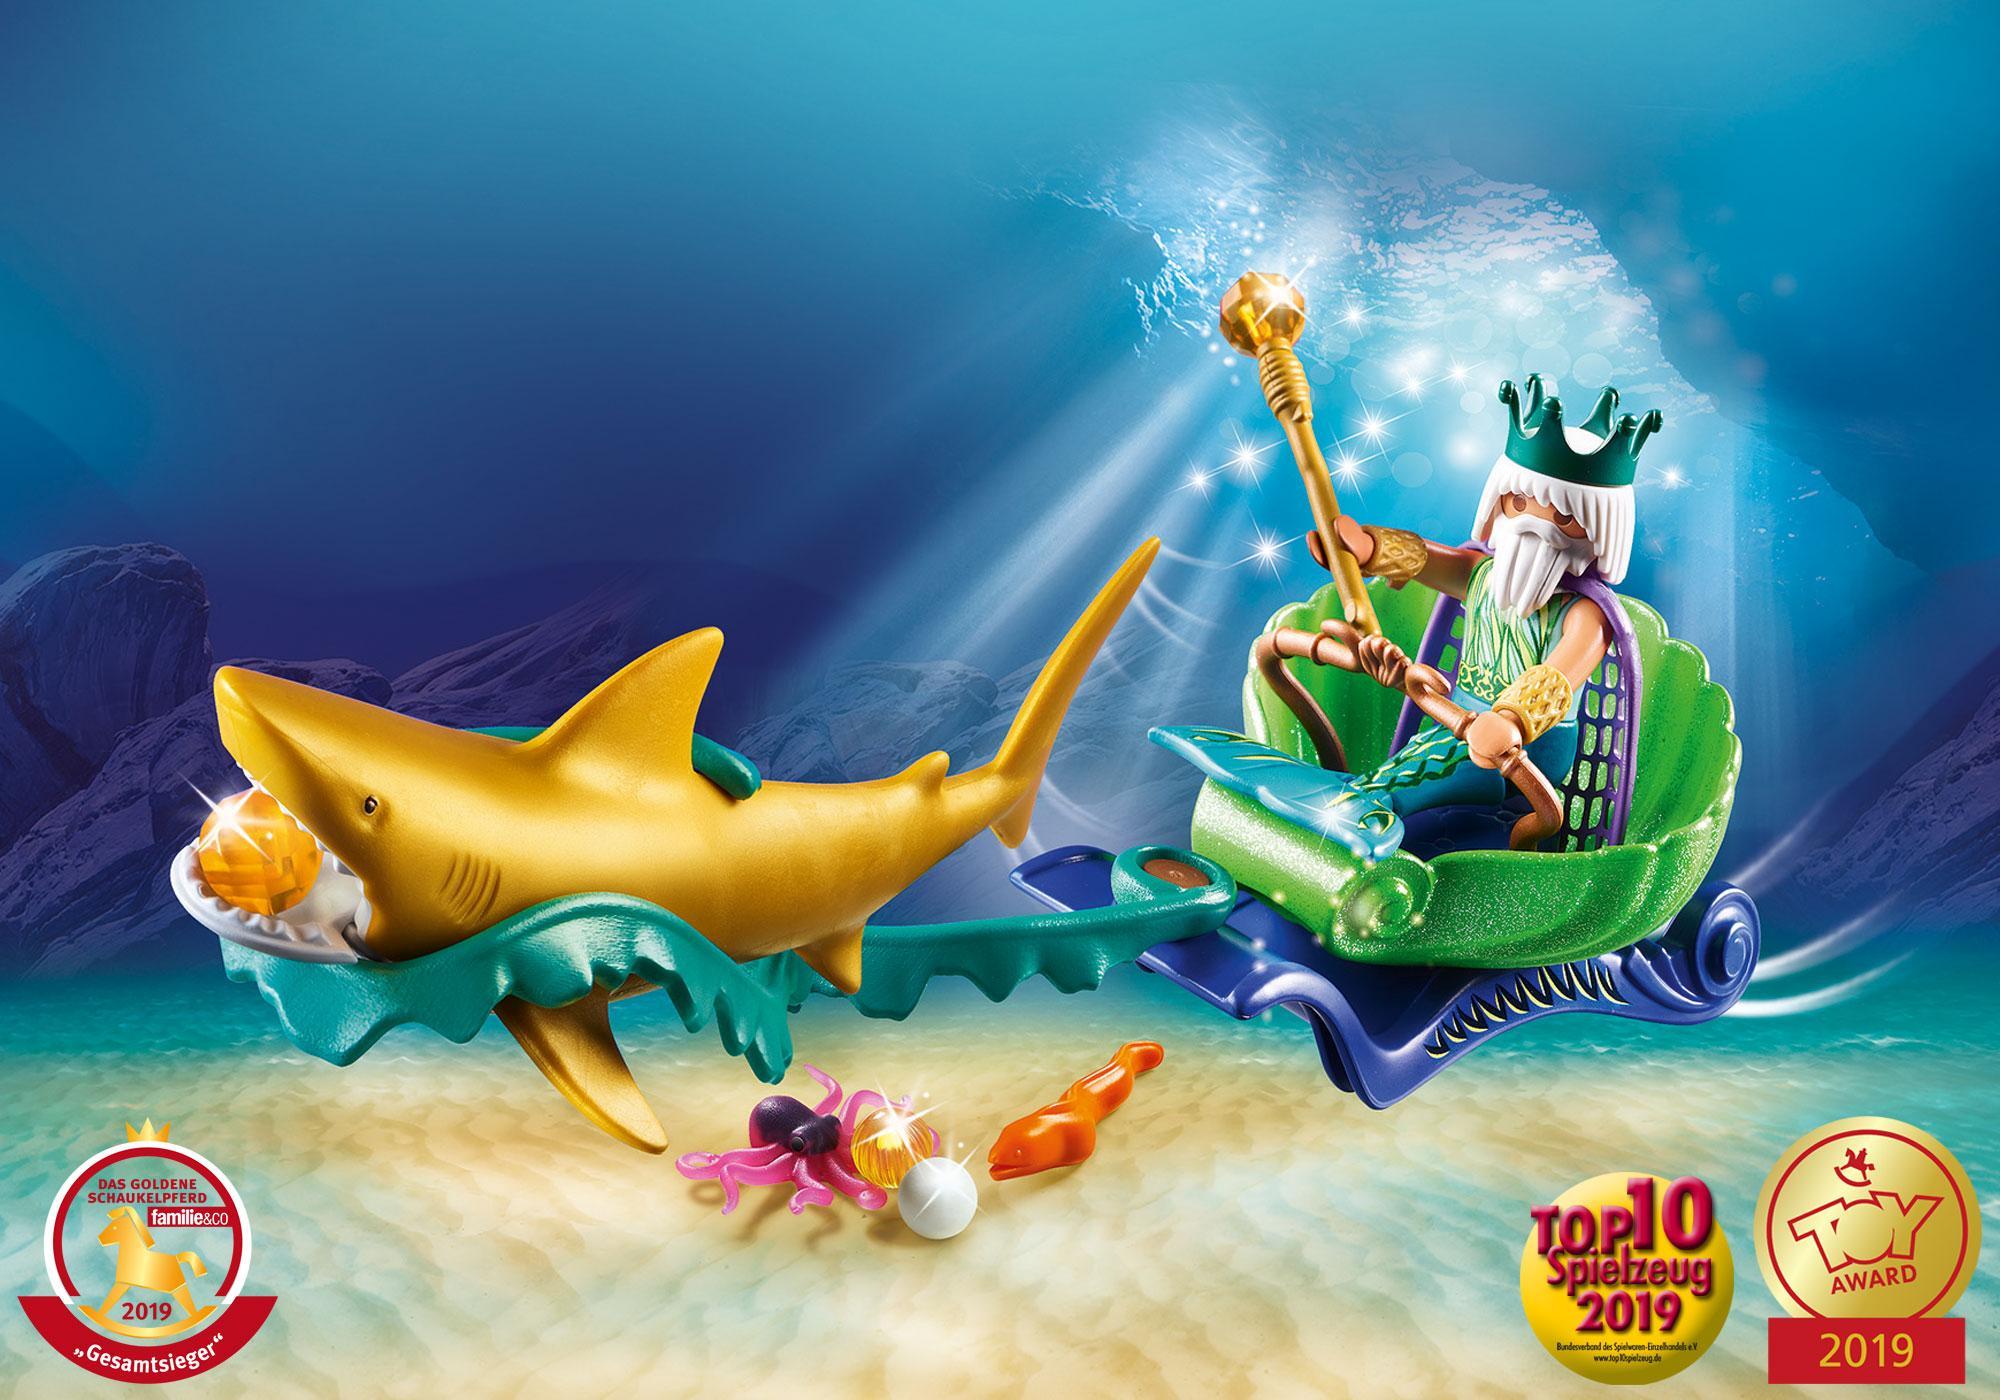 70097_product_detail/Koning der zeeën met haaienkoets